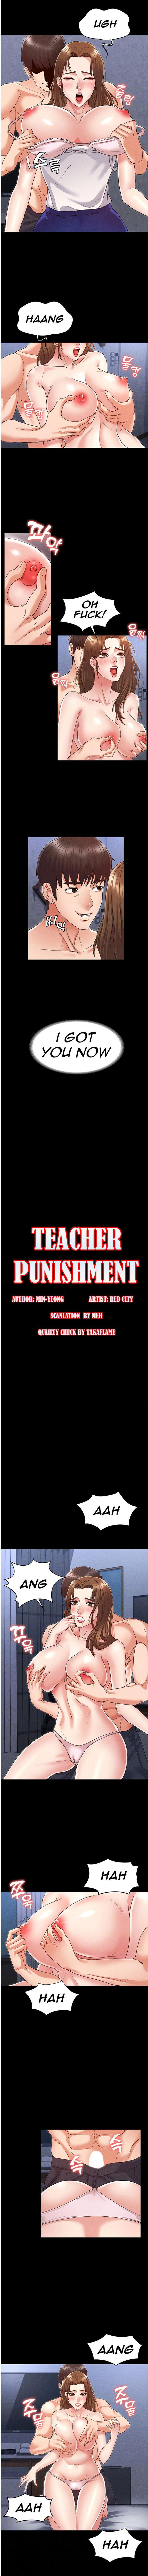 TEACHER PUNISHMENT Ch.1-16 19